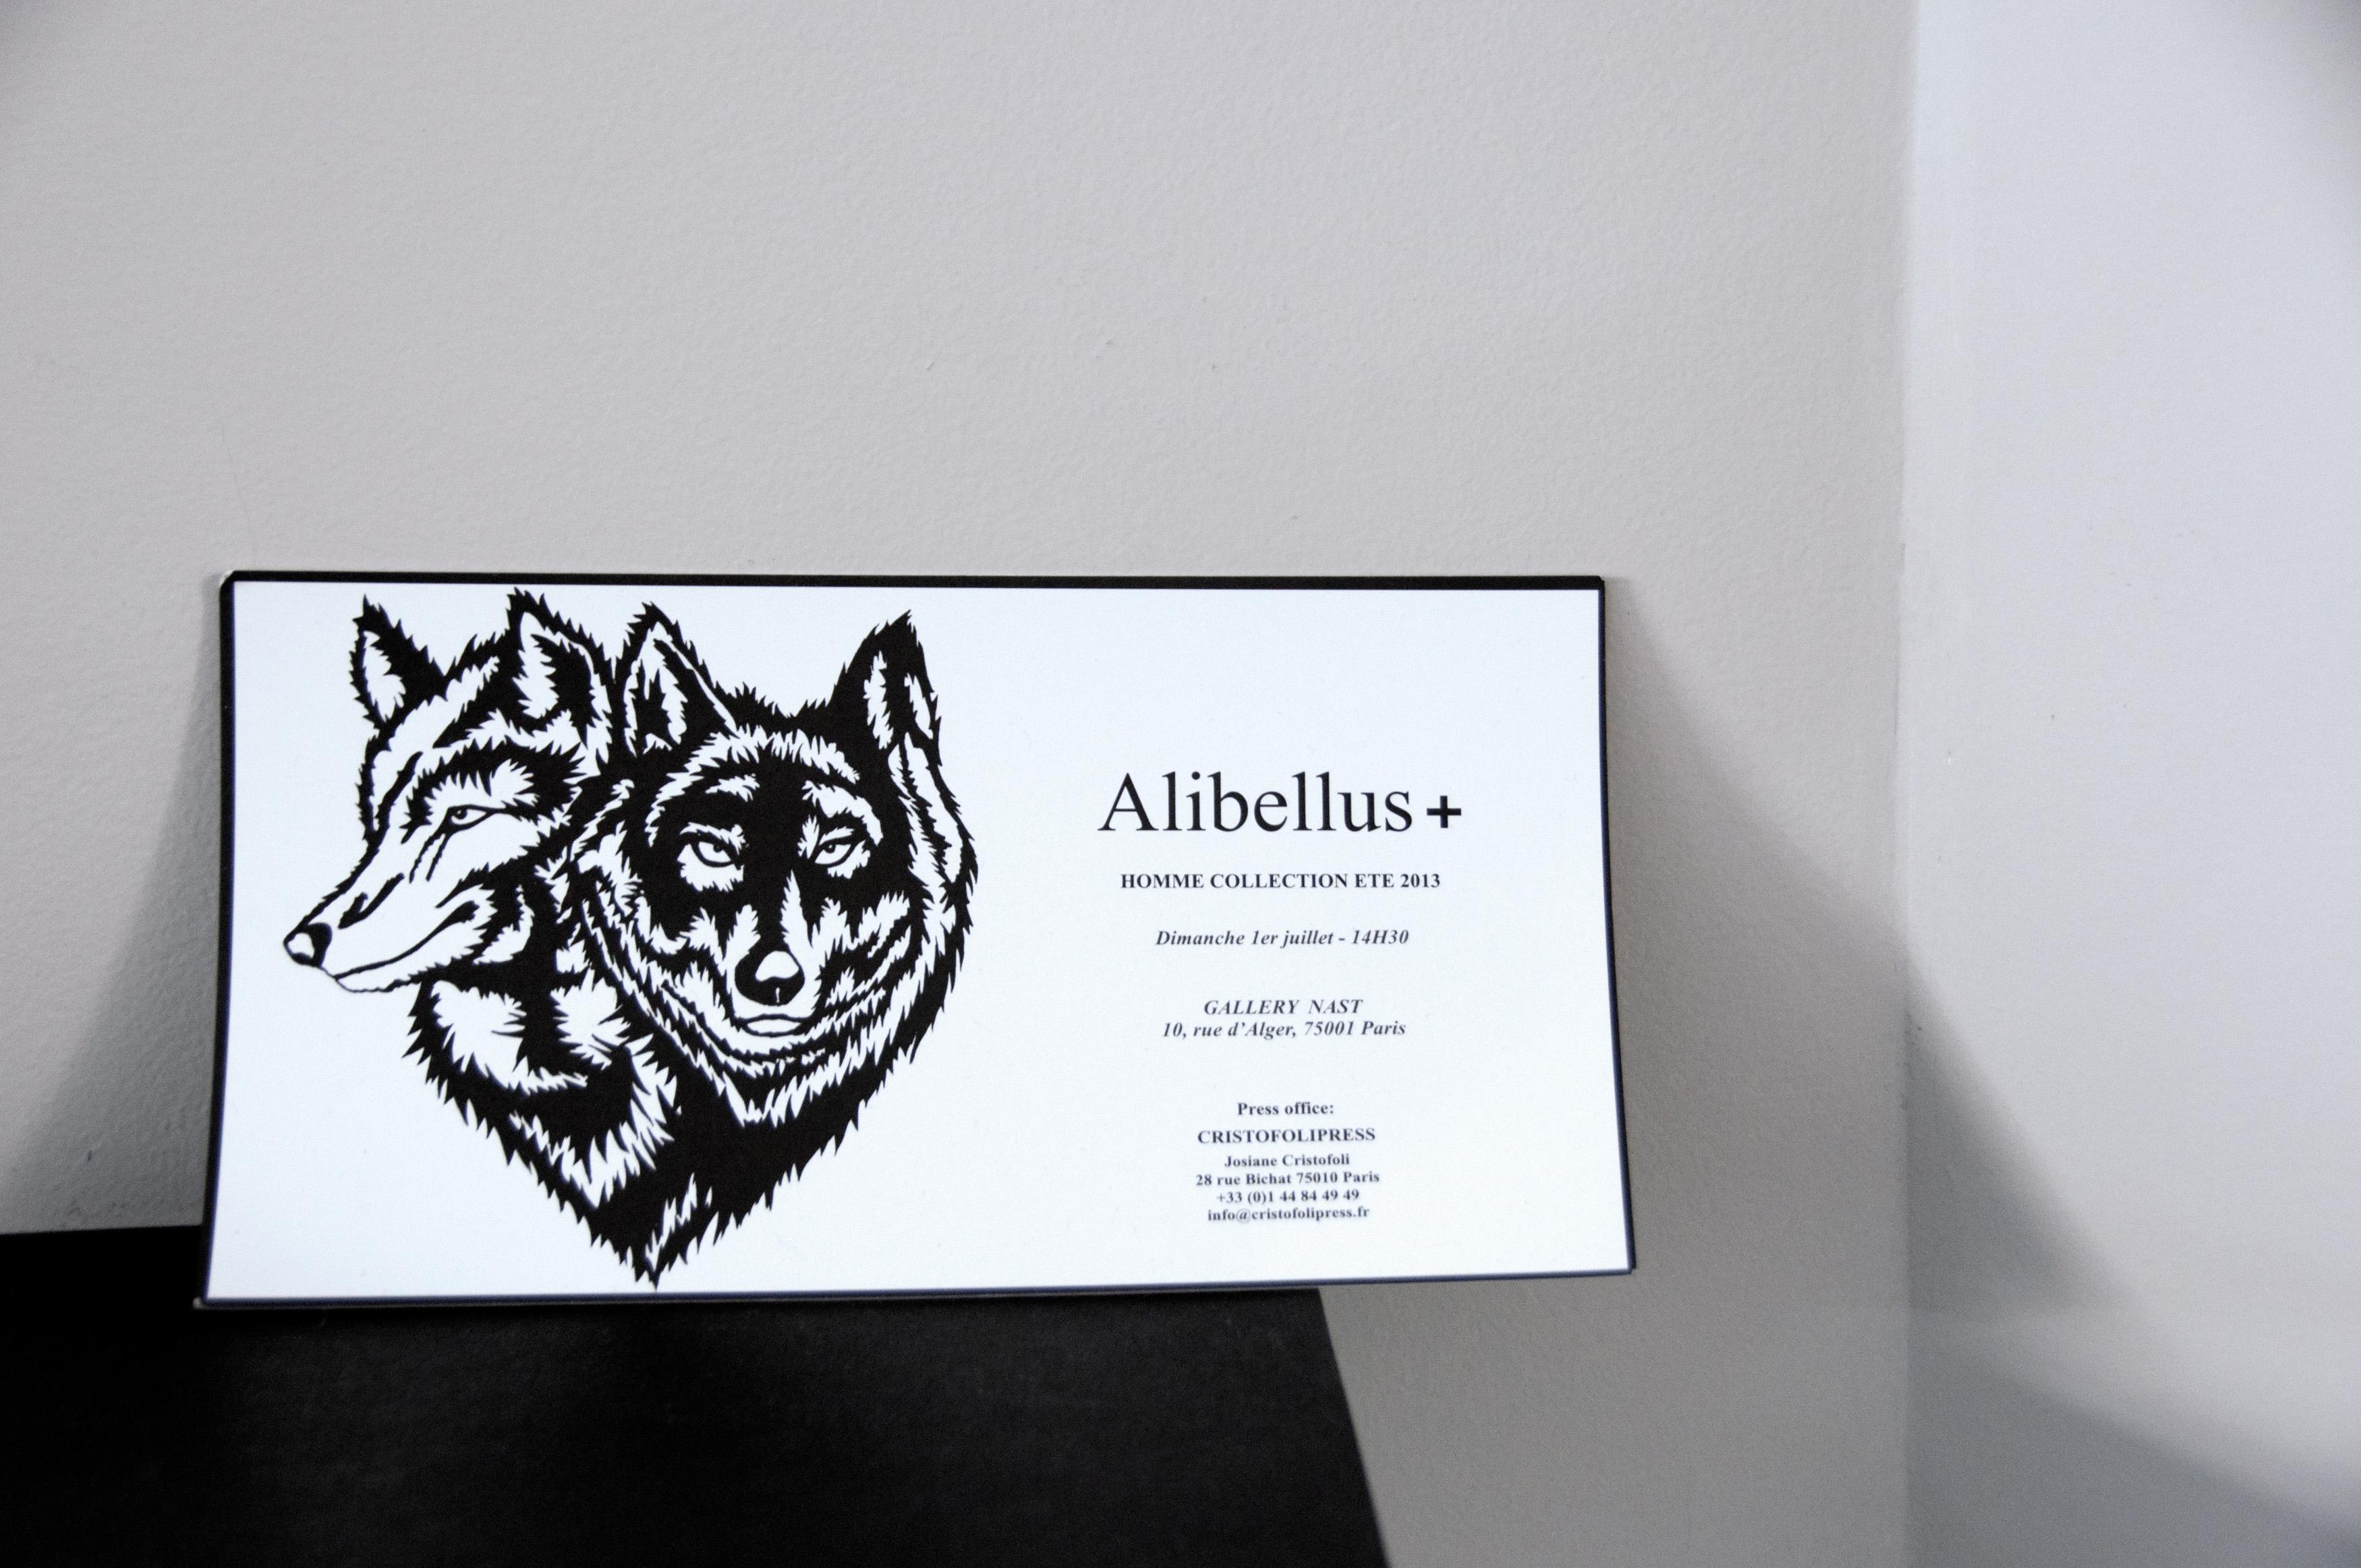 ALIBELLUS+ SS13